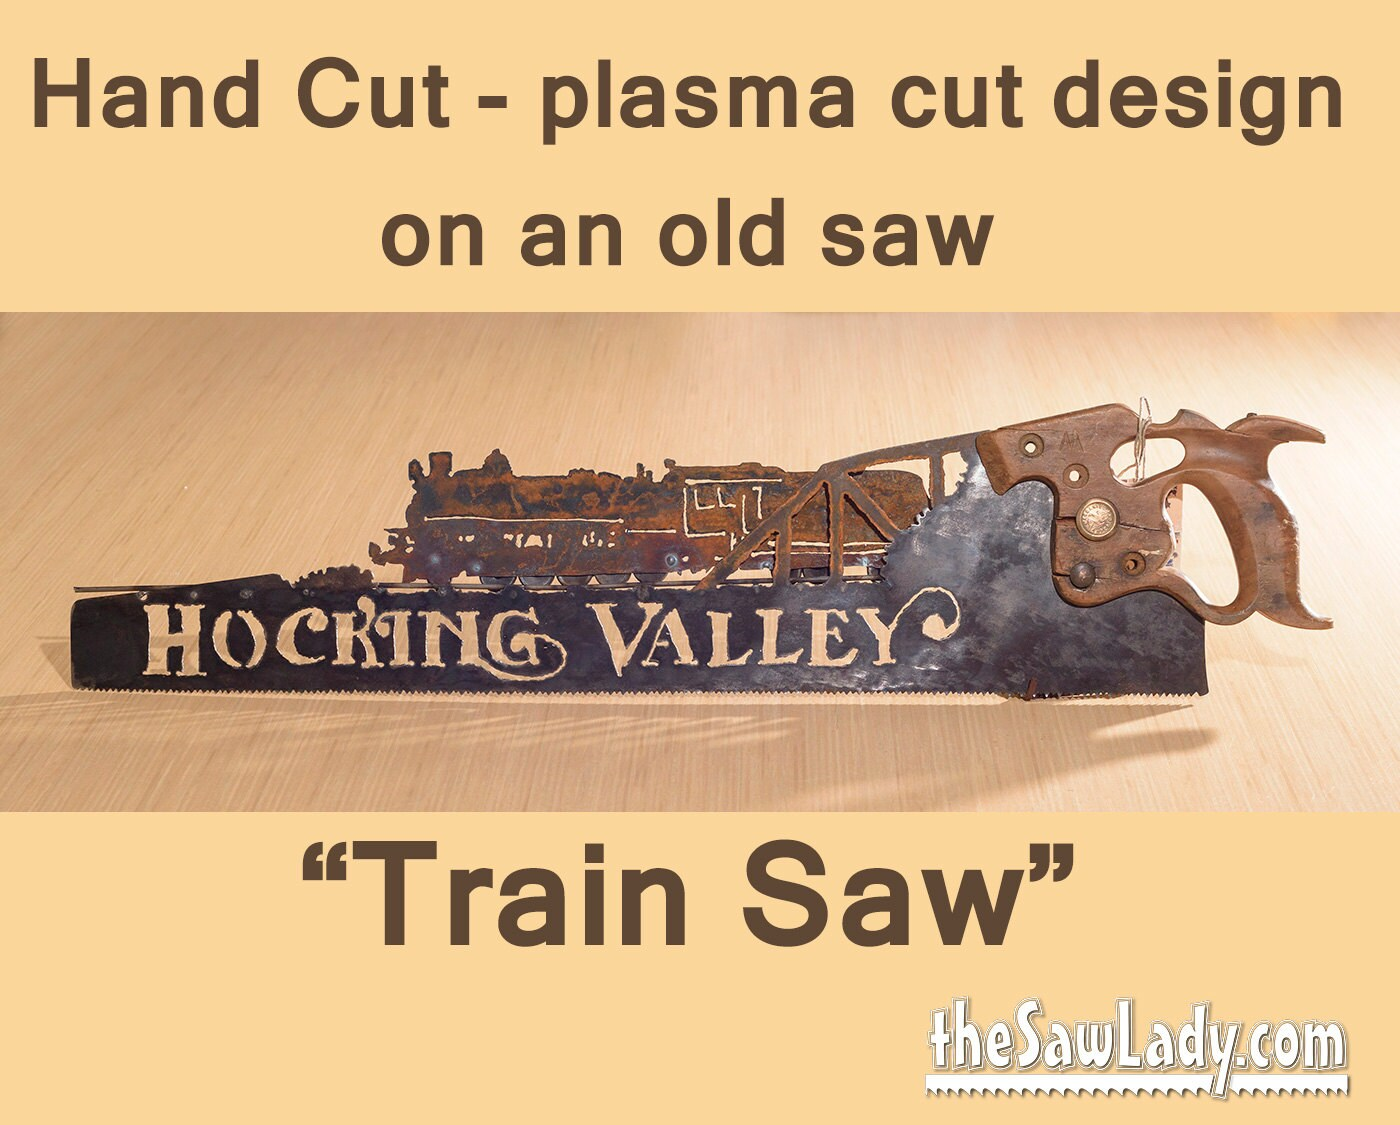 TRAIN or Railroad design Hand plasma cut hand saw Metal Art | Etsy